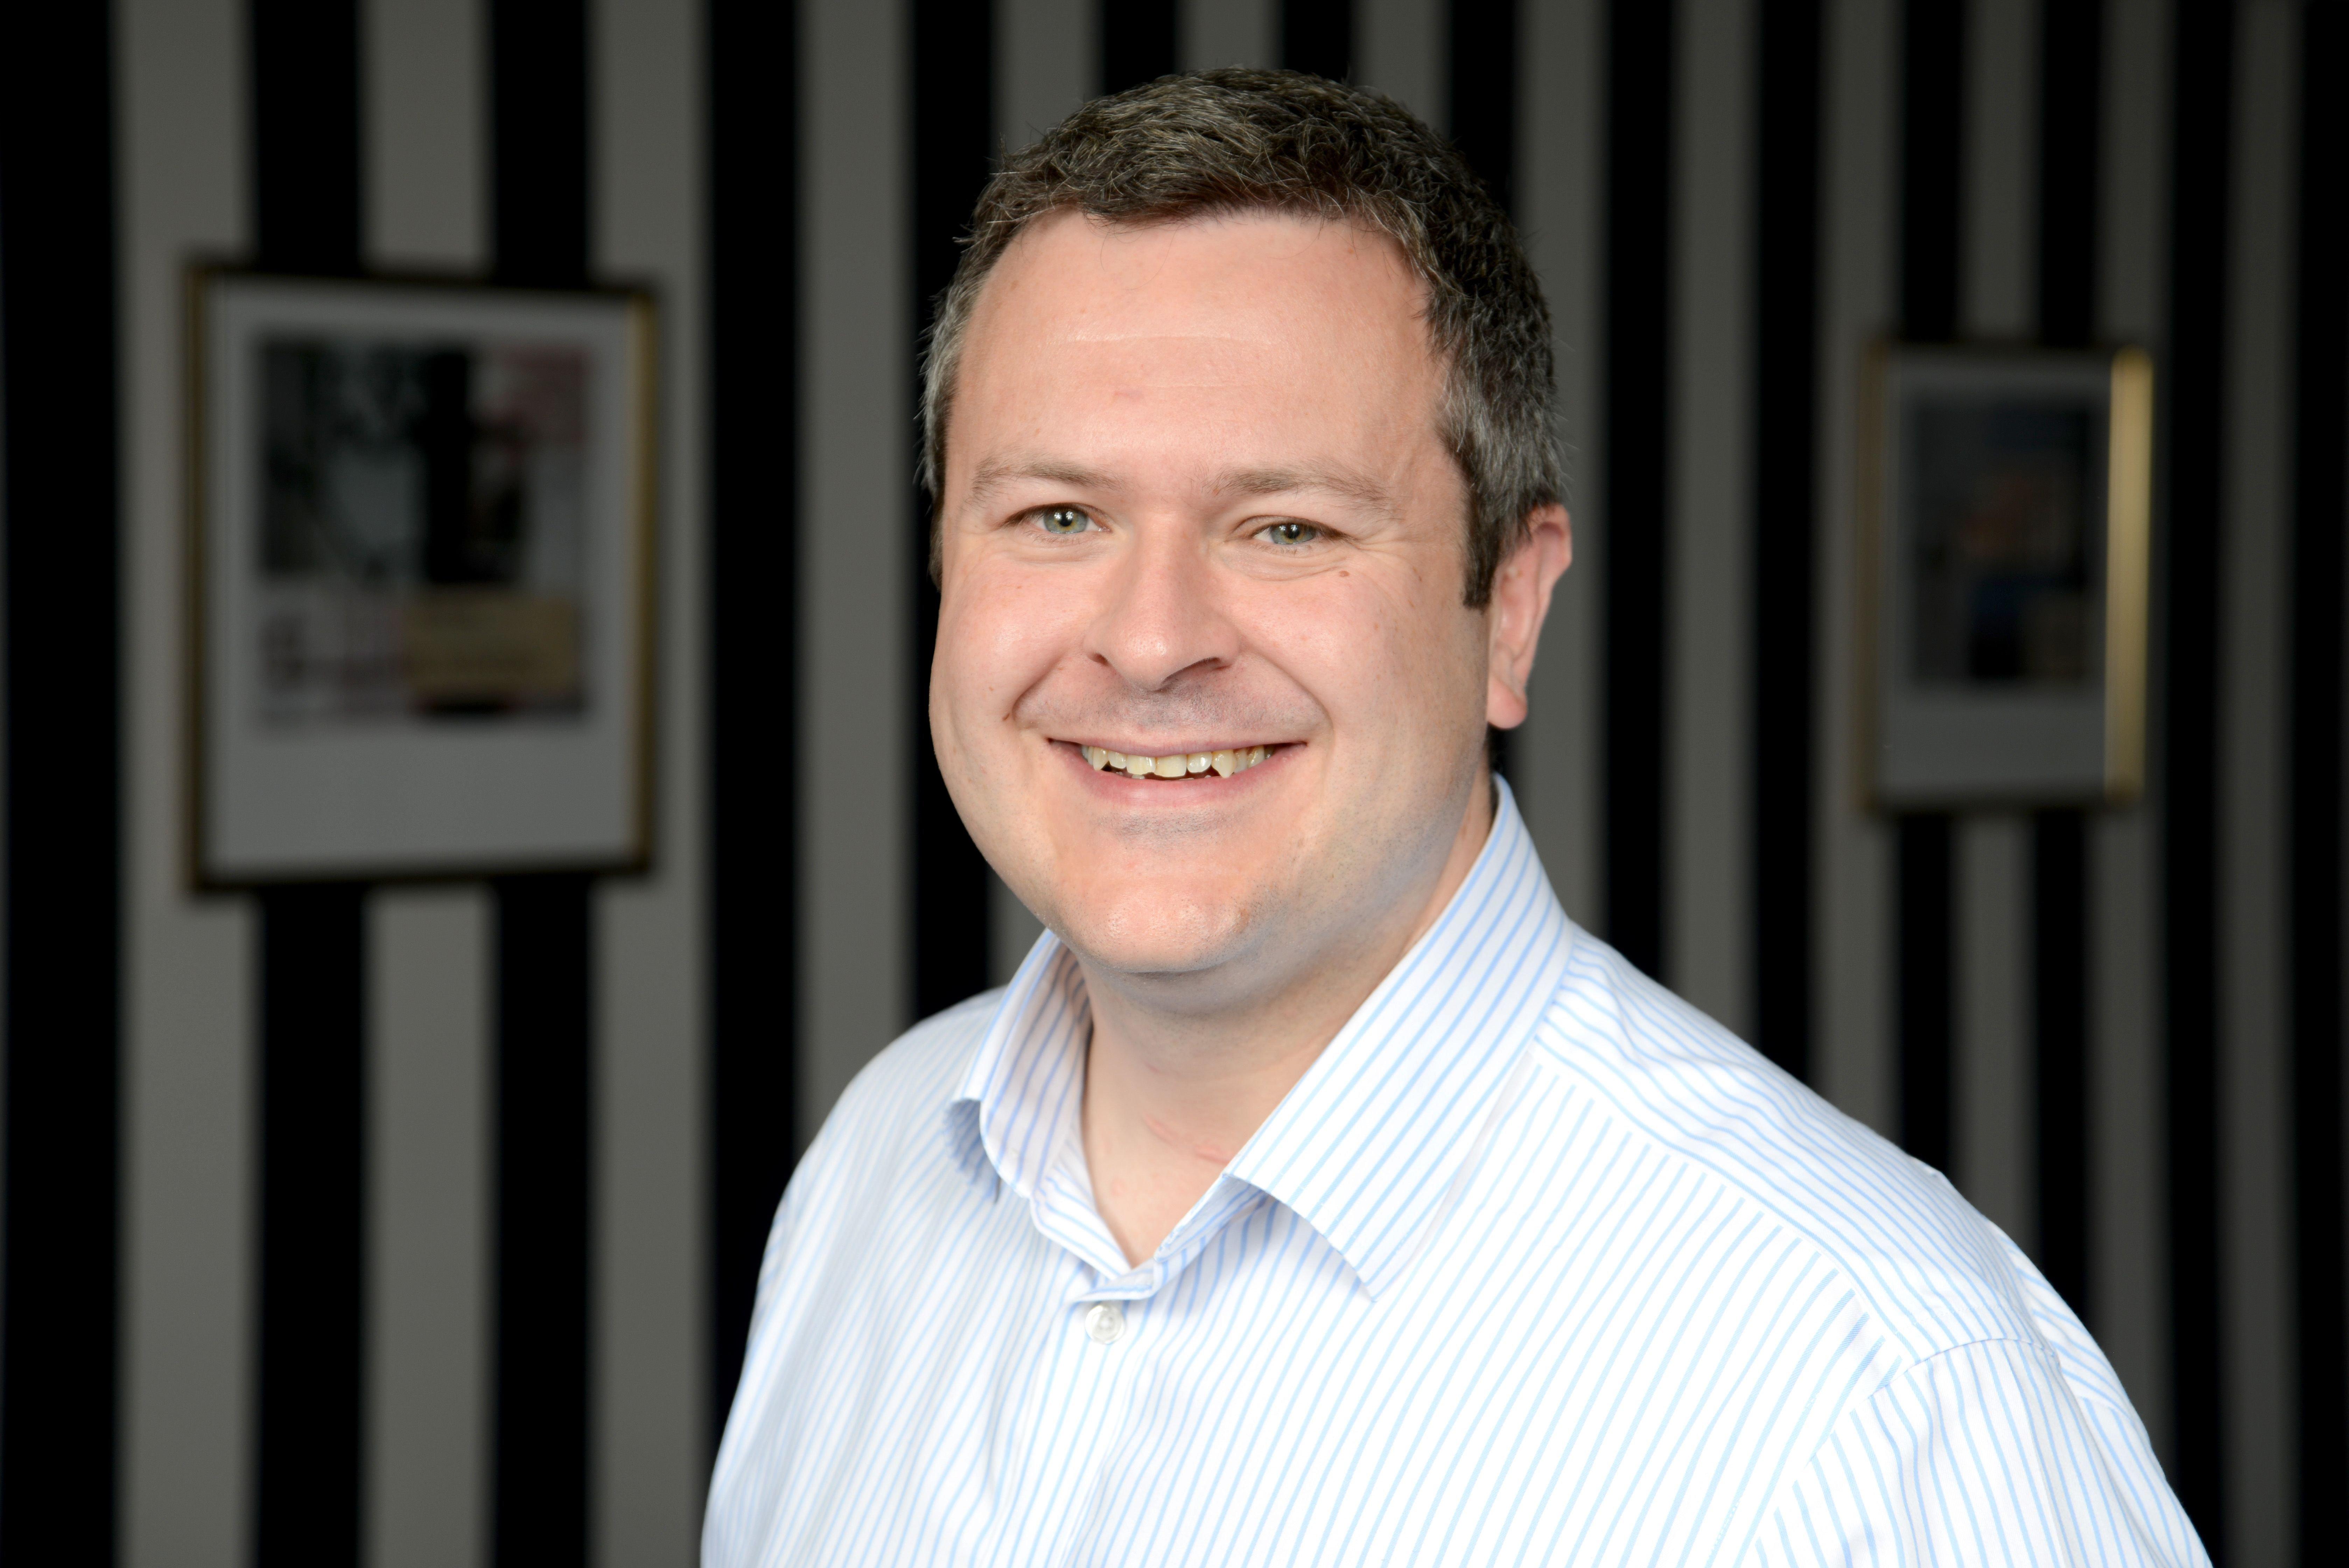 Duncan & Toplis director joins accountancy ethics board